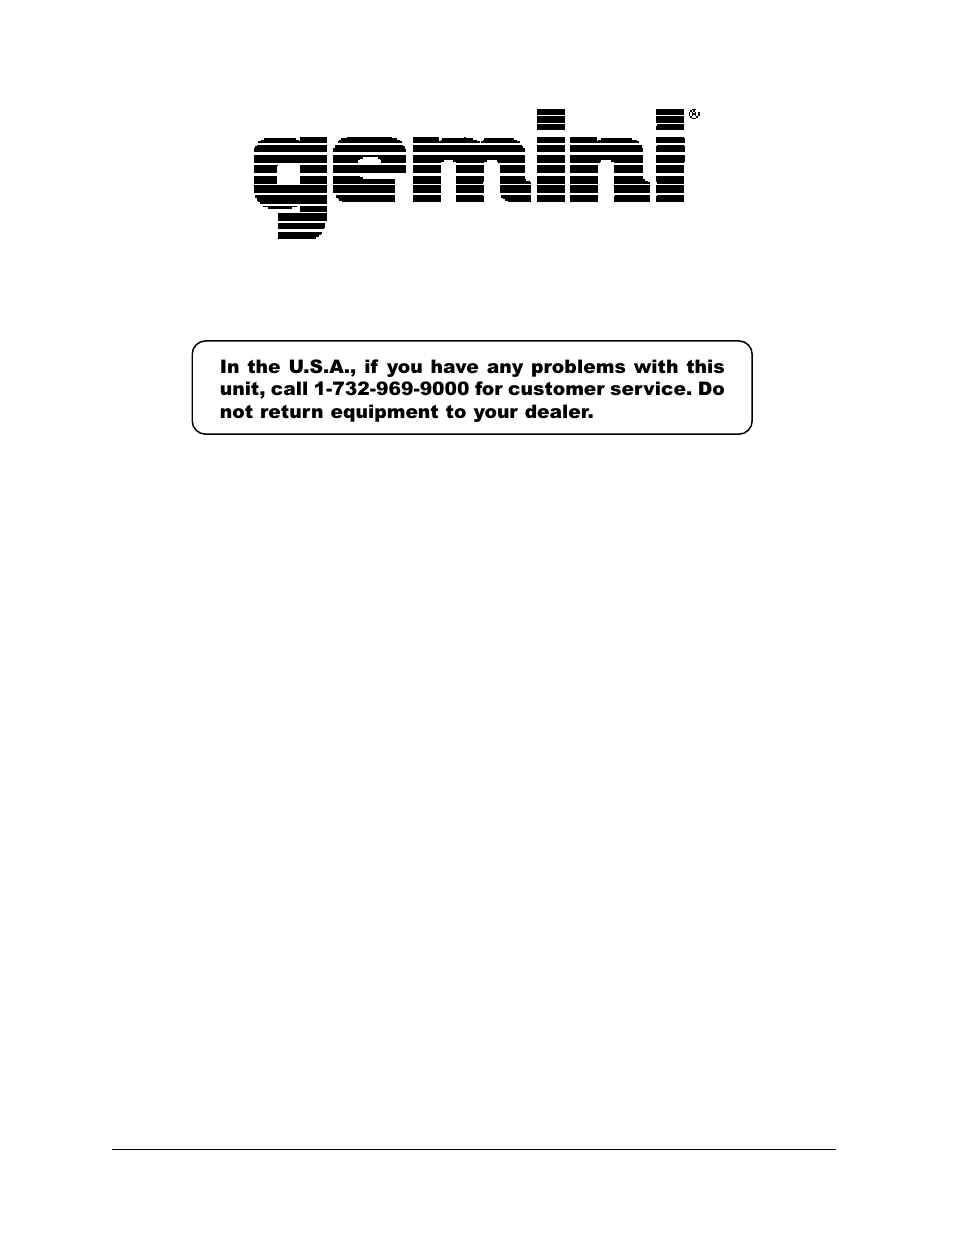 Dealer recommended maintenance user manuals engine oil synthetic vs regular array gemini bpm 250 user manual page 6 6 rh manualsdir fandeluxe Images